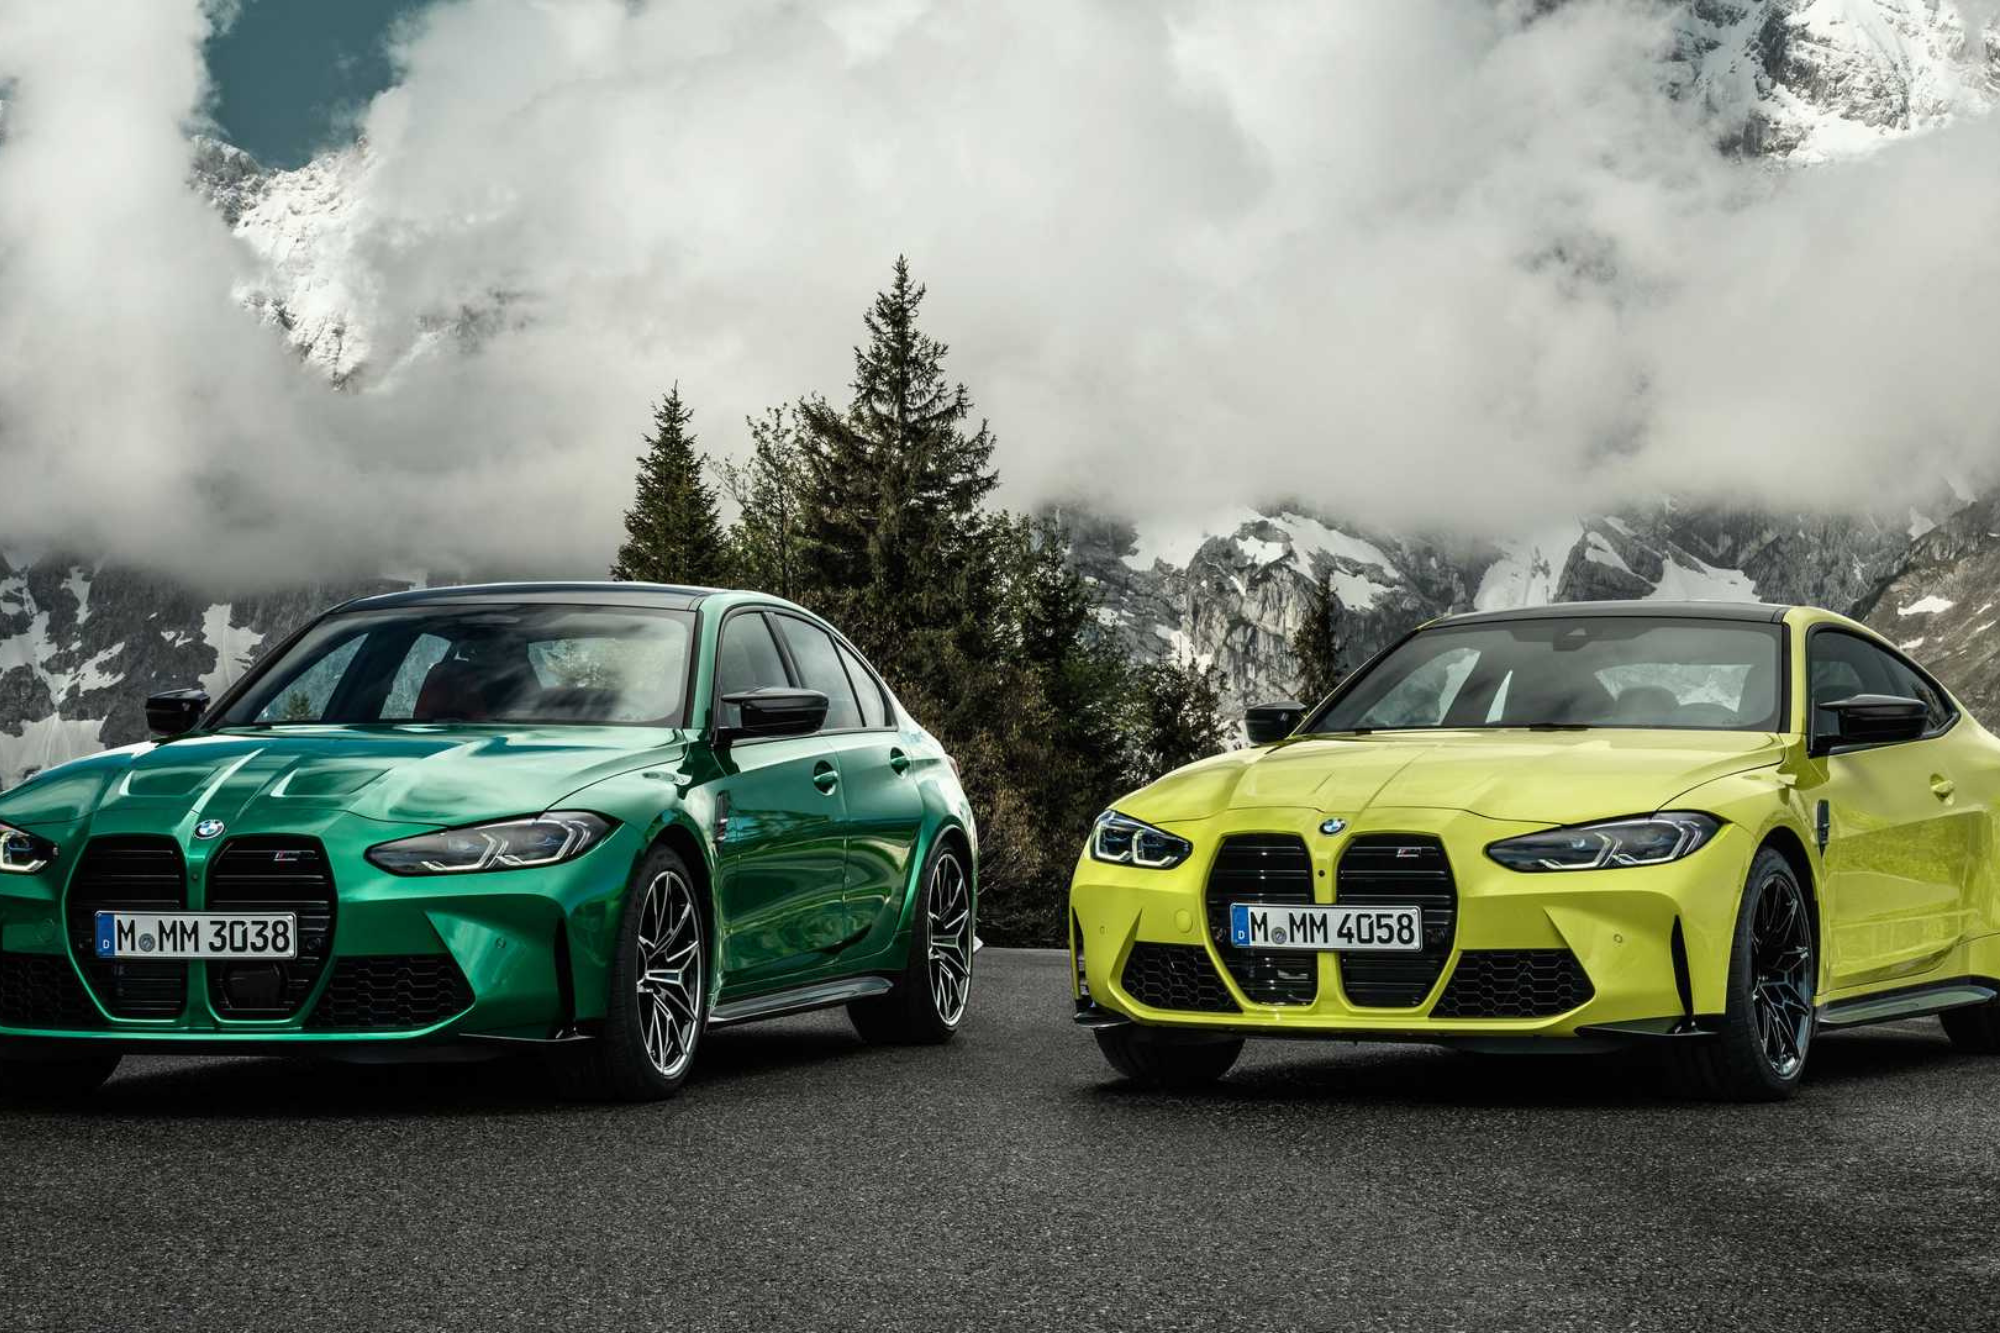 BMW M3 vs M4 - Handling, Performance, Weight